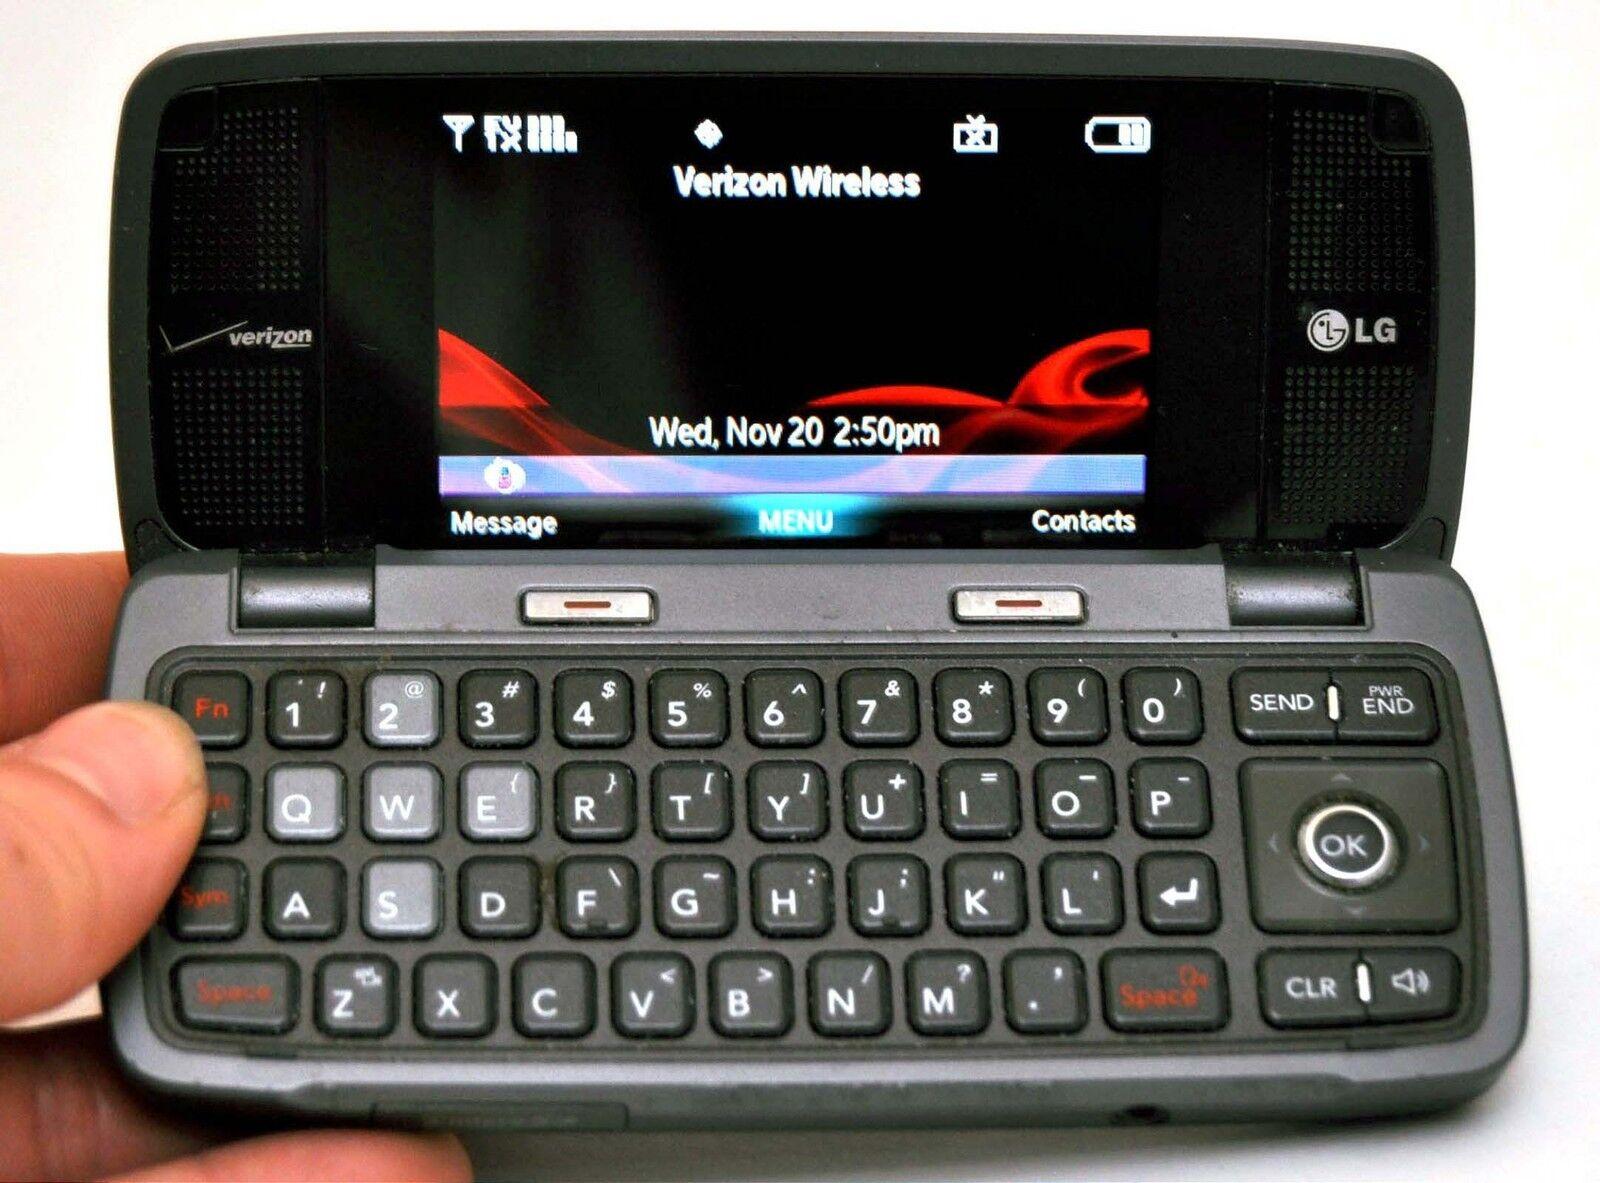 lg voyager vx10000s verizon cell phone titanium flip qwerty keyboard rh ebay com LG Touch Phone Operating Manual LG Cell Phone Operating Manual